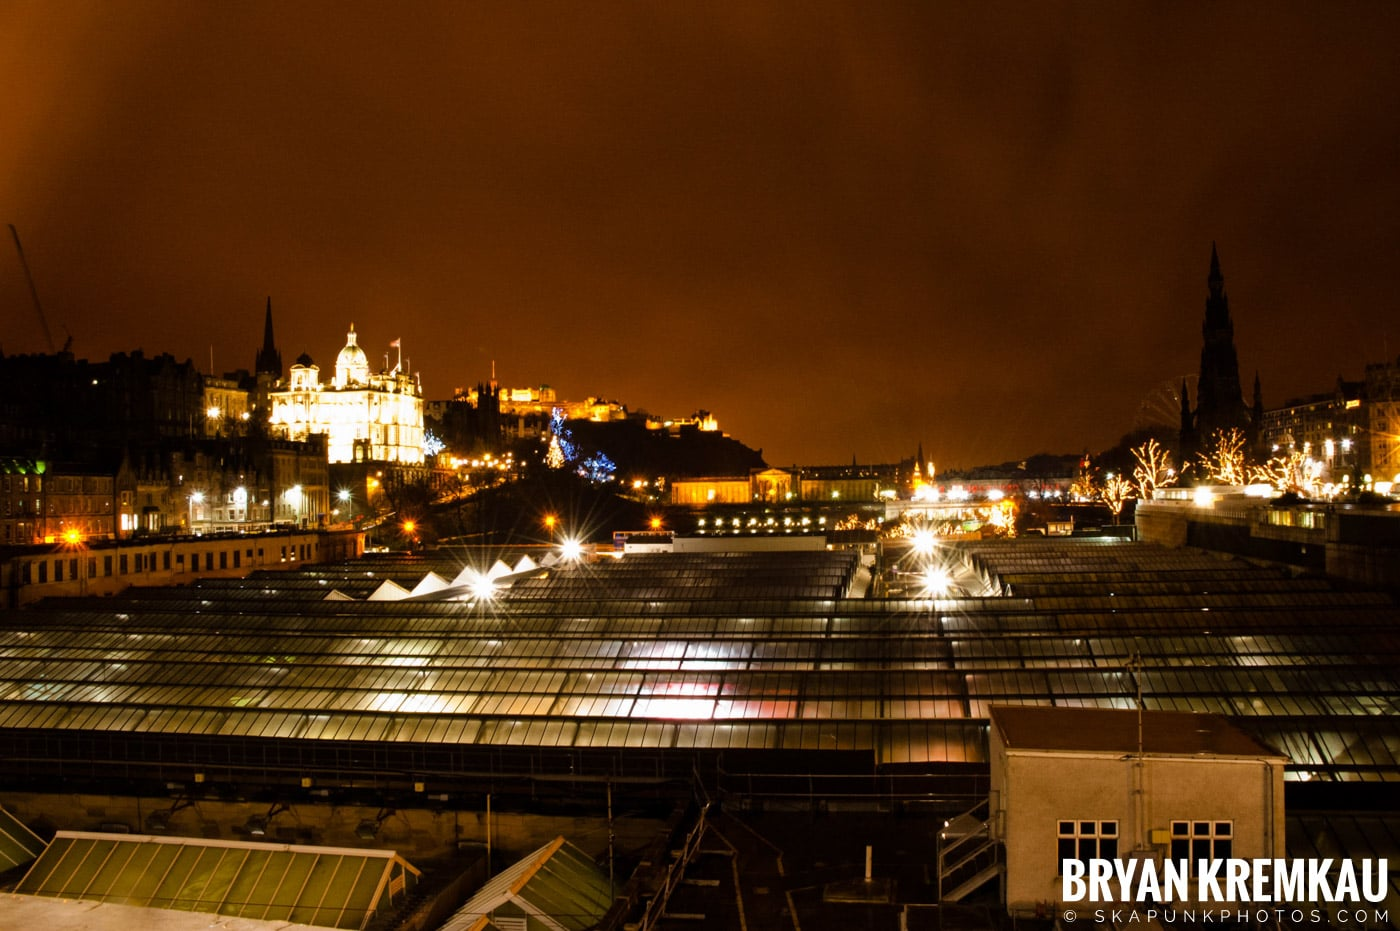 Edinburgh, Scotland - Day 3 - 12.14.06 (2)